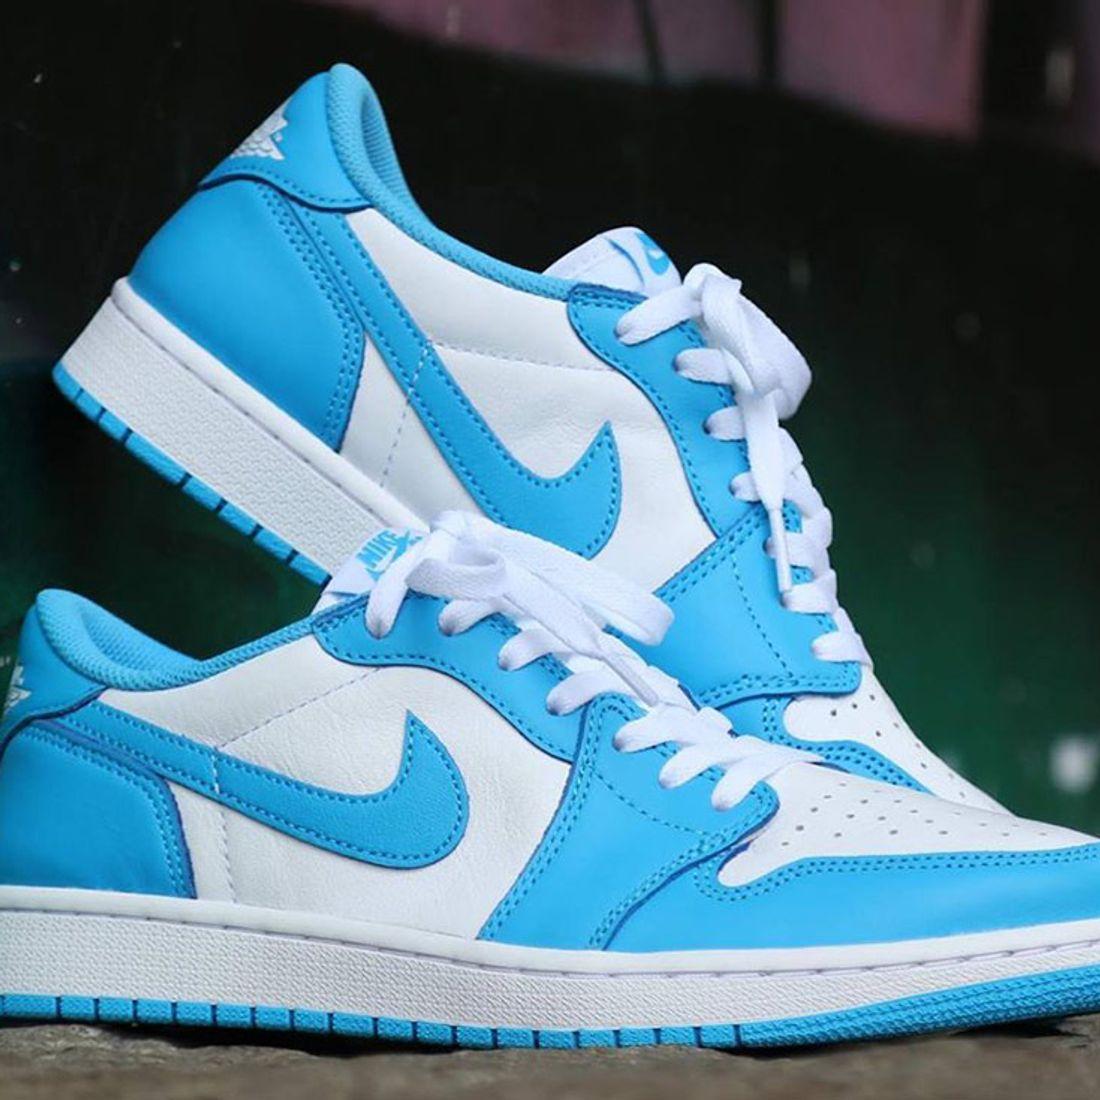 Where To Buy The Nike Sb Air Jordan 1 Low Dark Powder Blue